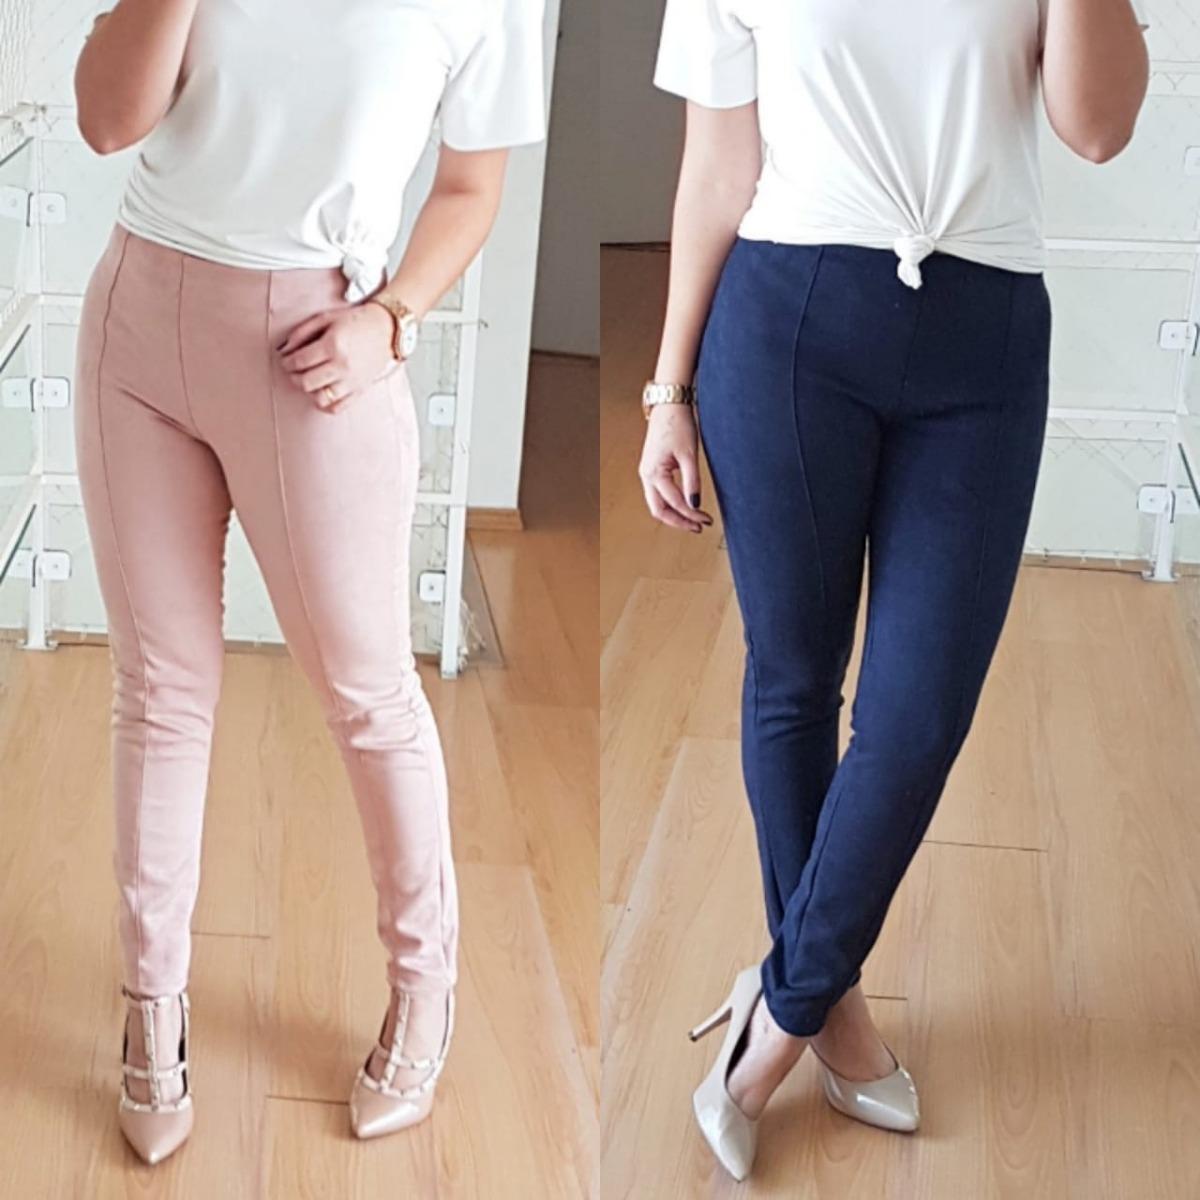 337c5db09 calça skinny feminina suede/camurça/veludo corte reto. Carregando zoom.